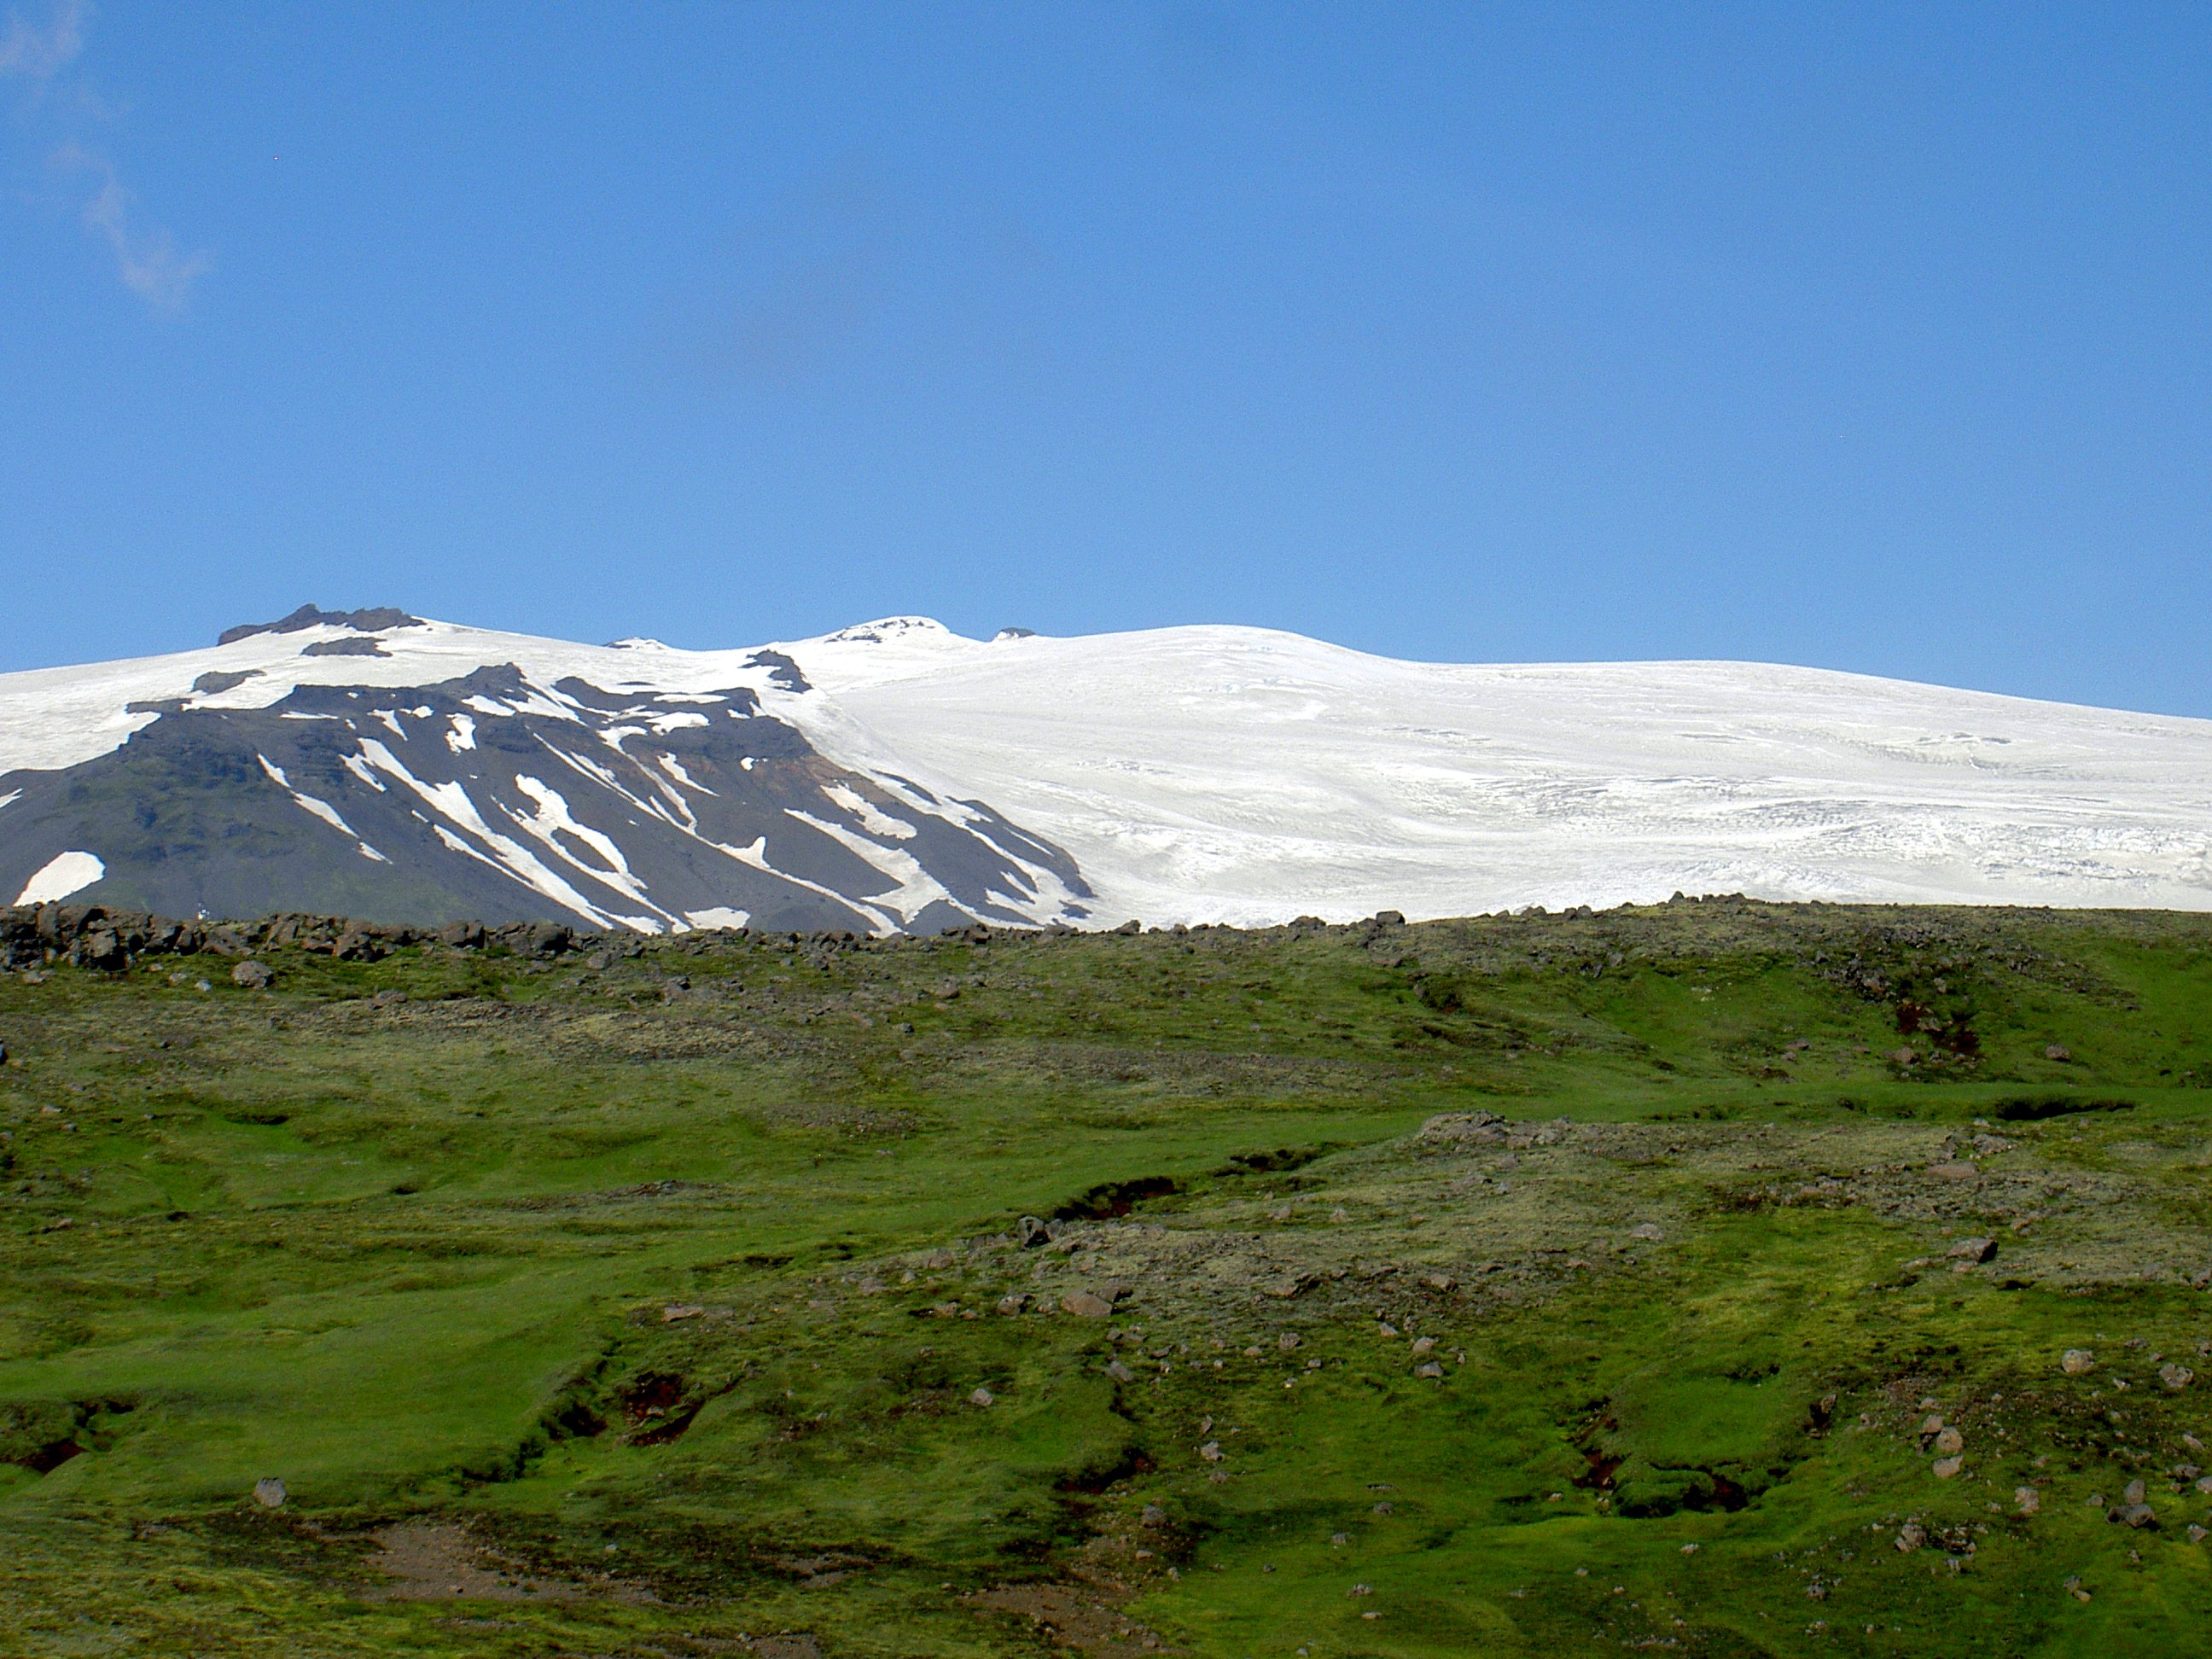 glacier in iceland Shakira Wikipedia